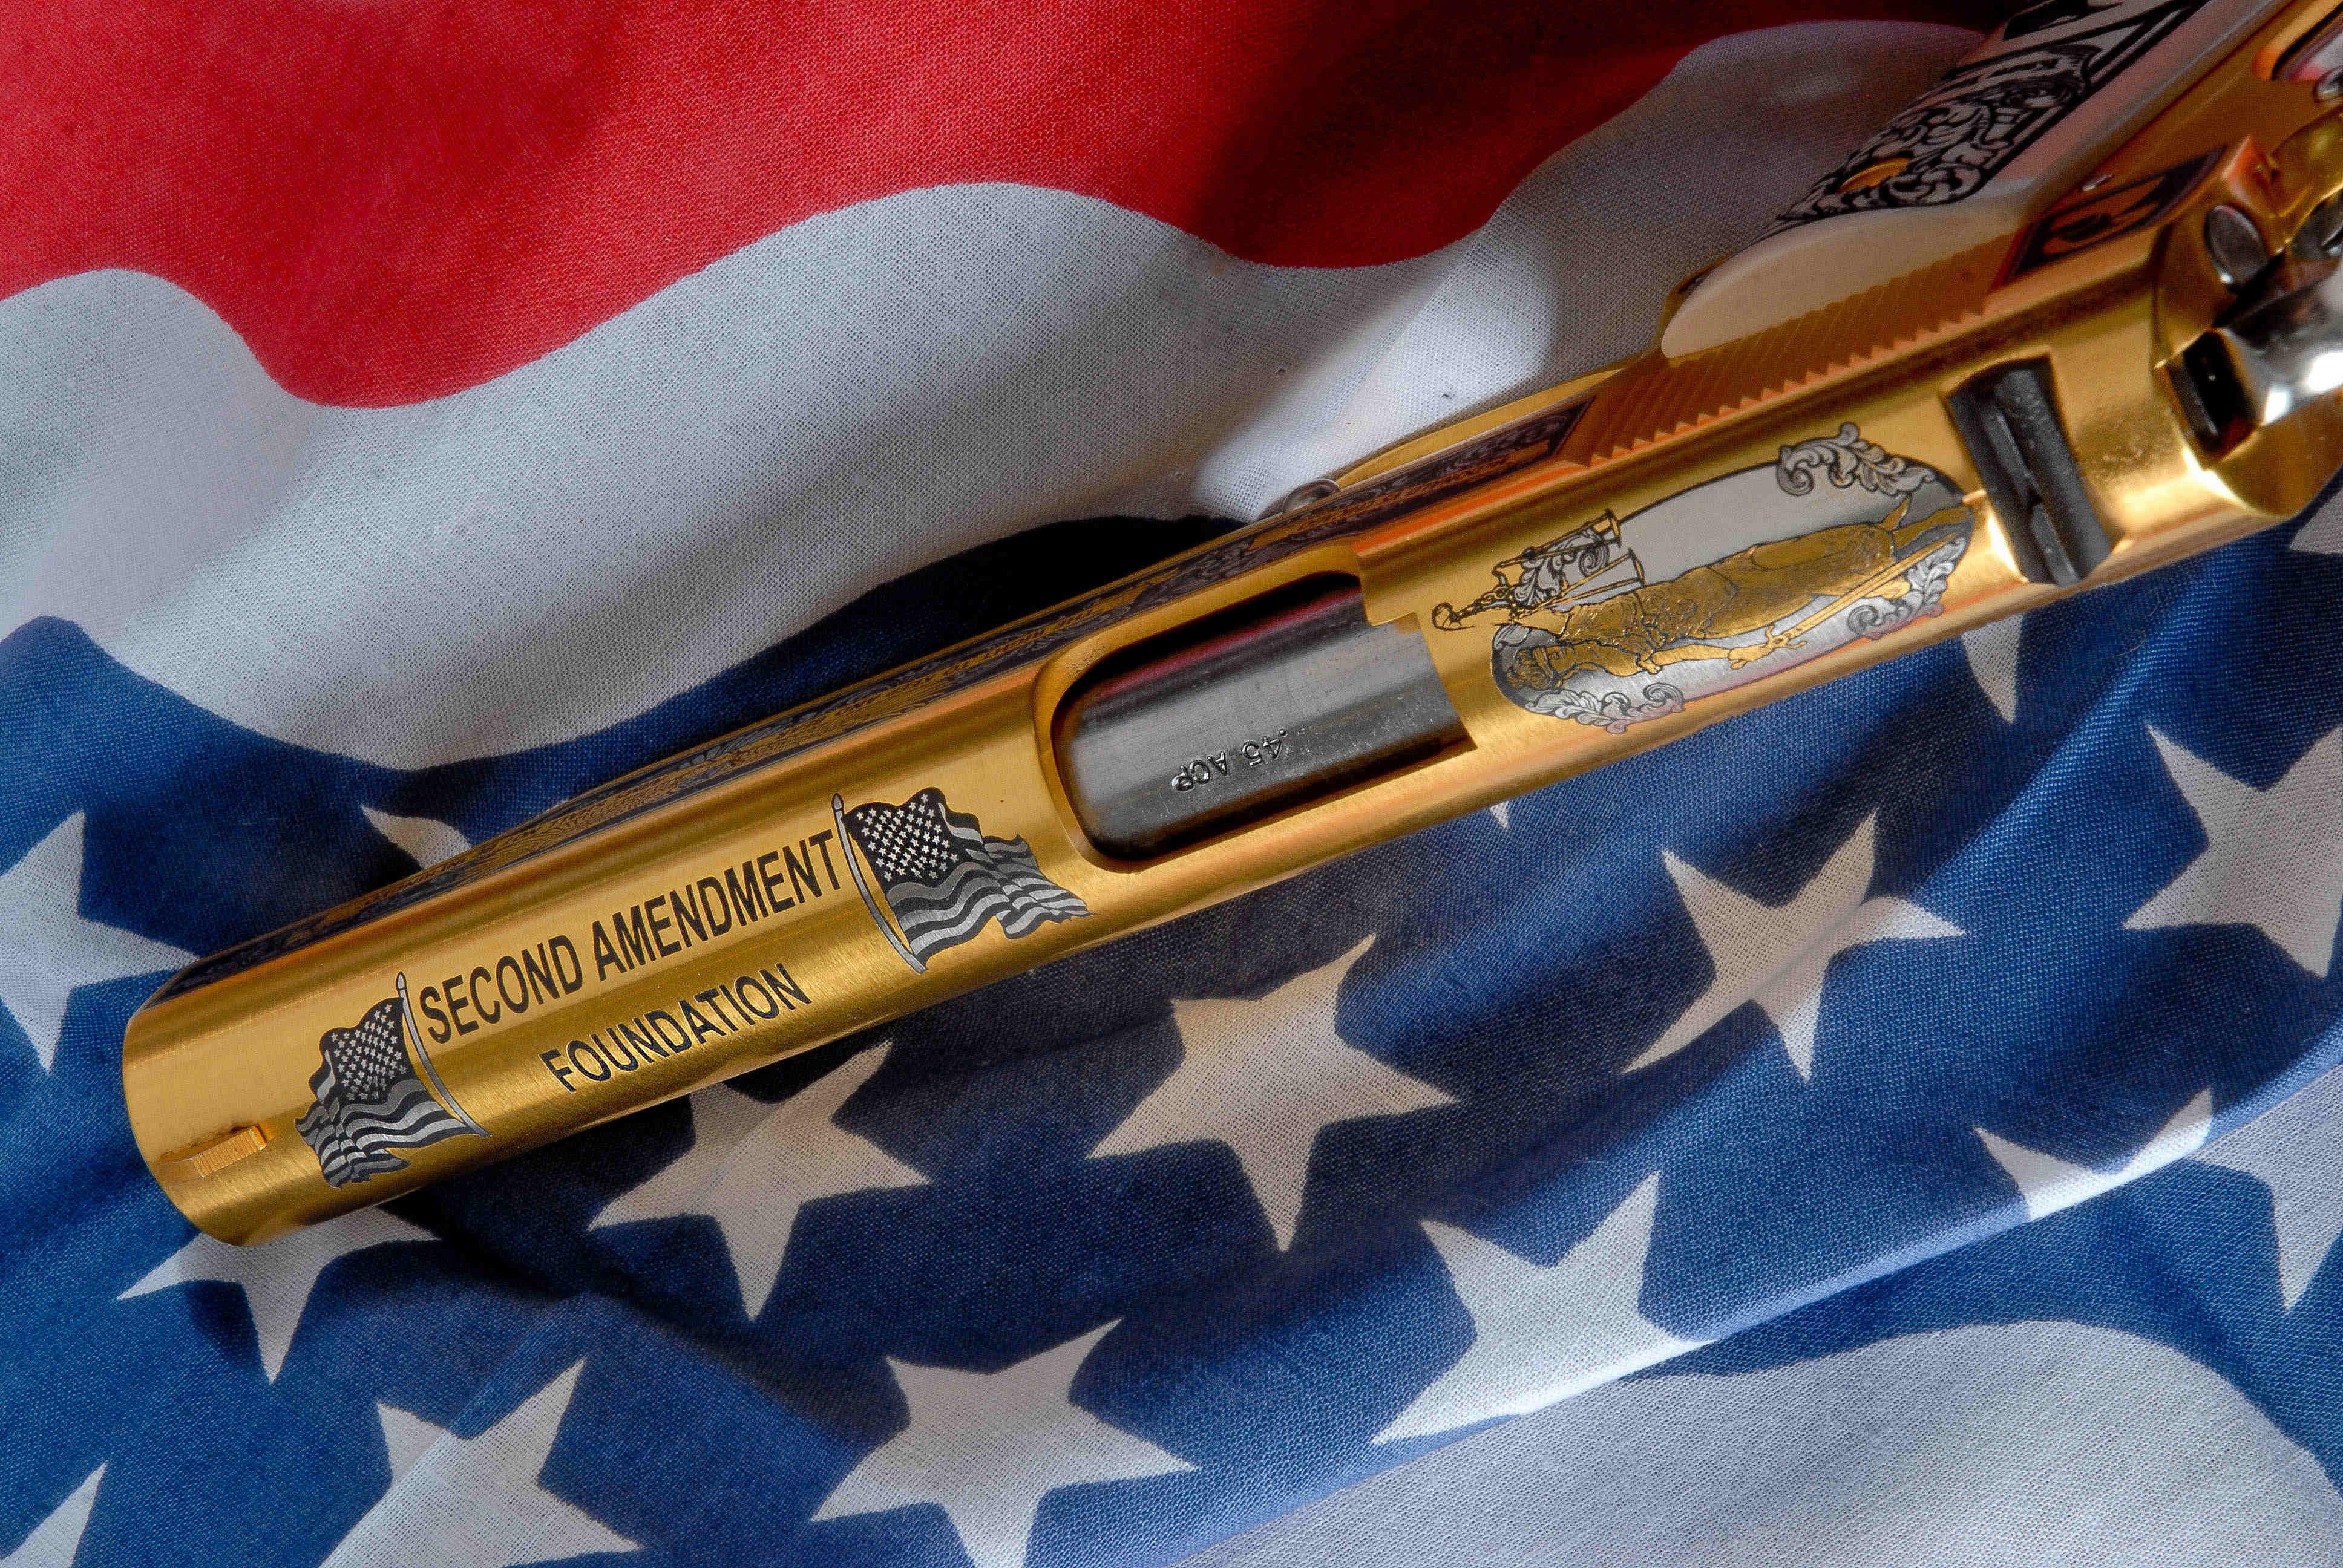 Second Amendment Foundation Pistol Alaska American Legacy